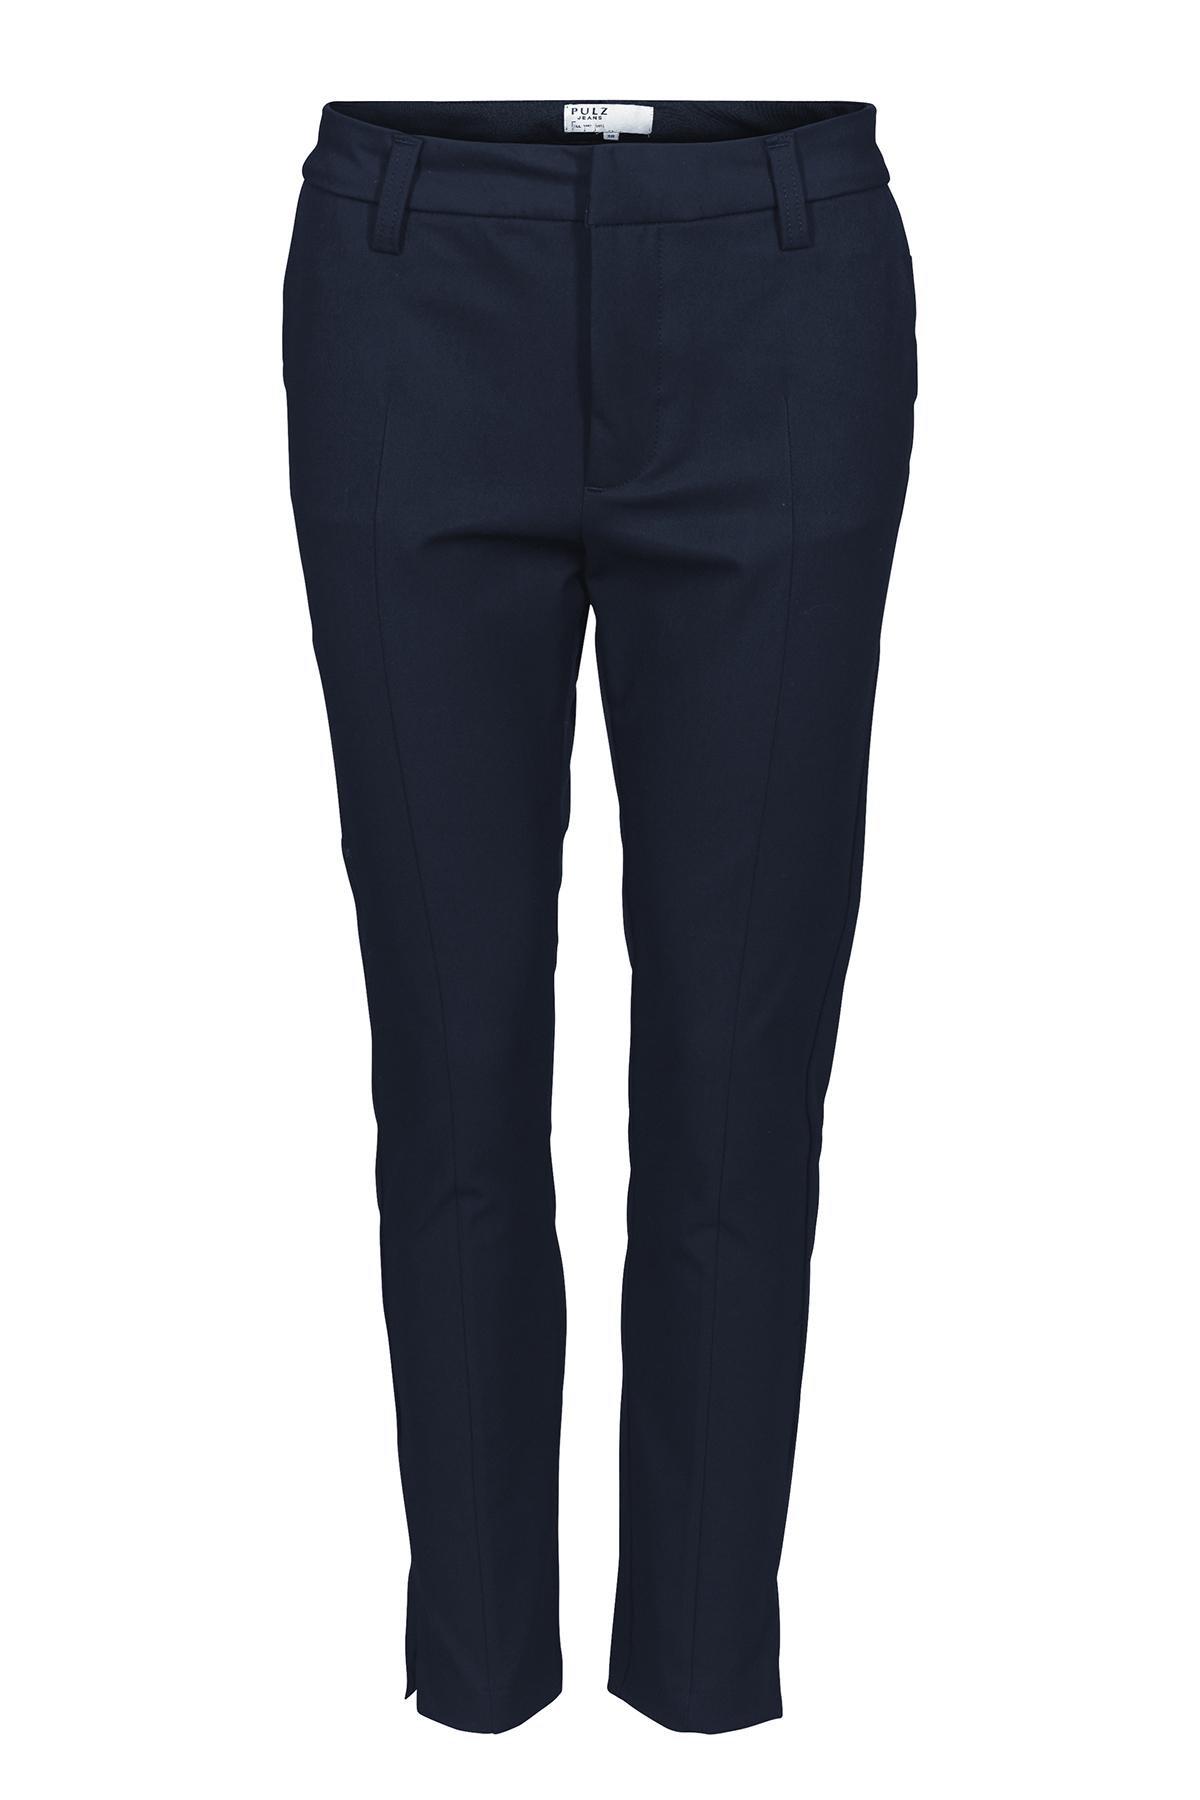 Pulz Jeans Dame Enkelbroek - Donkerblauw